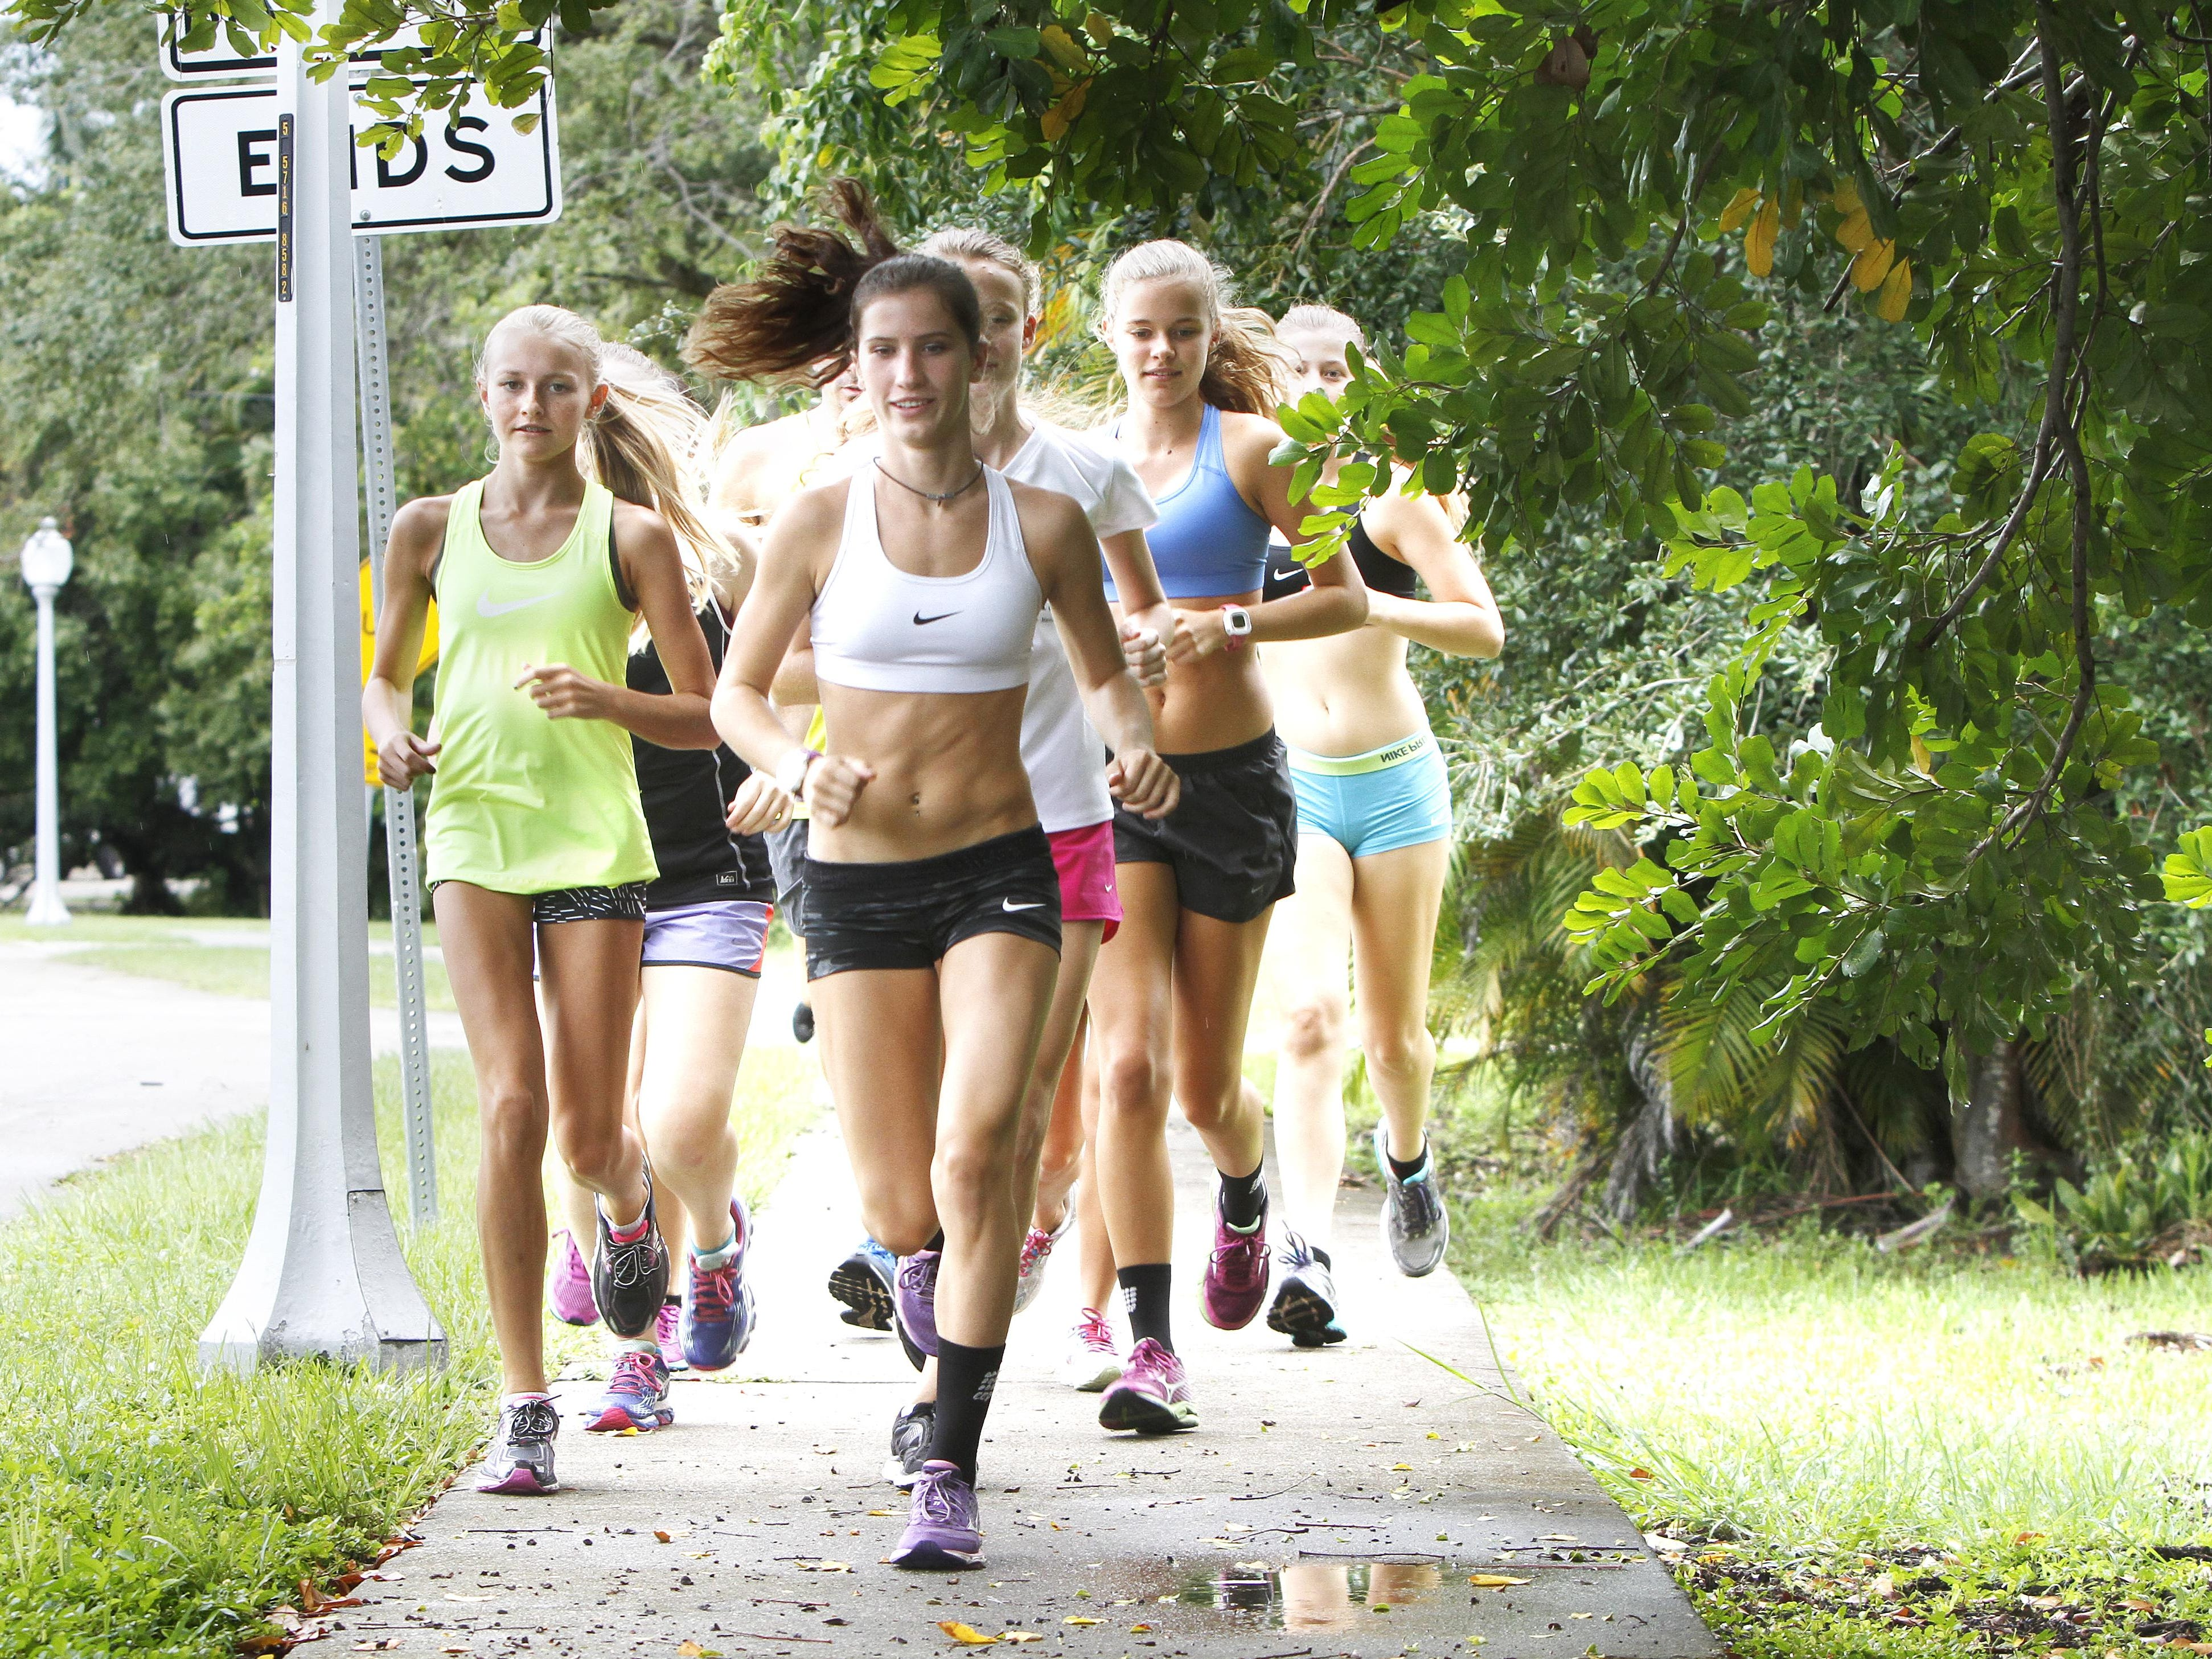 The Fort Myers High School cross country team, led by junior Kristlin Gear, center, runs the neighborhood sidewalks of historic Fort Myers Friday, August 28.